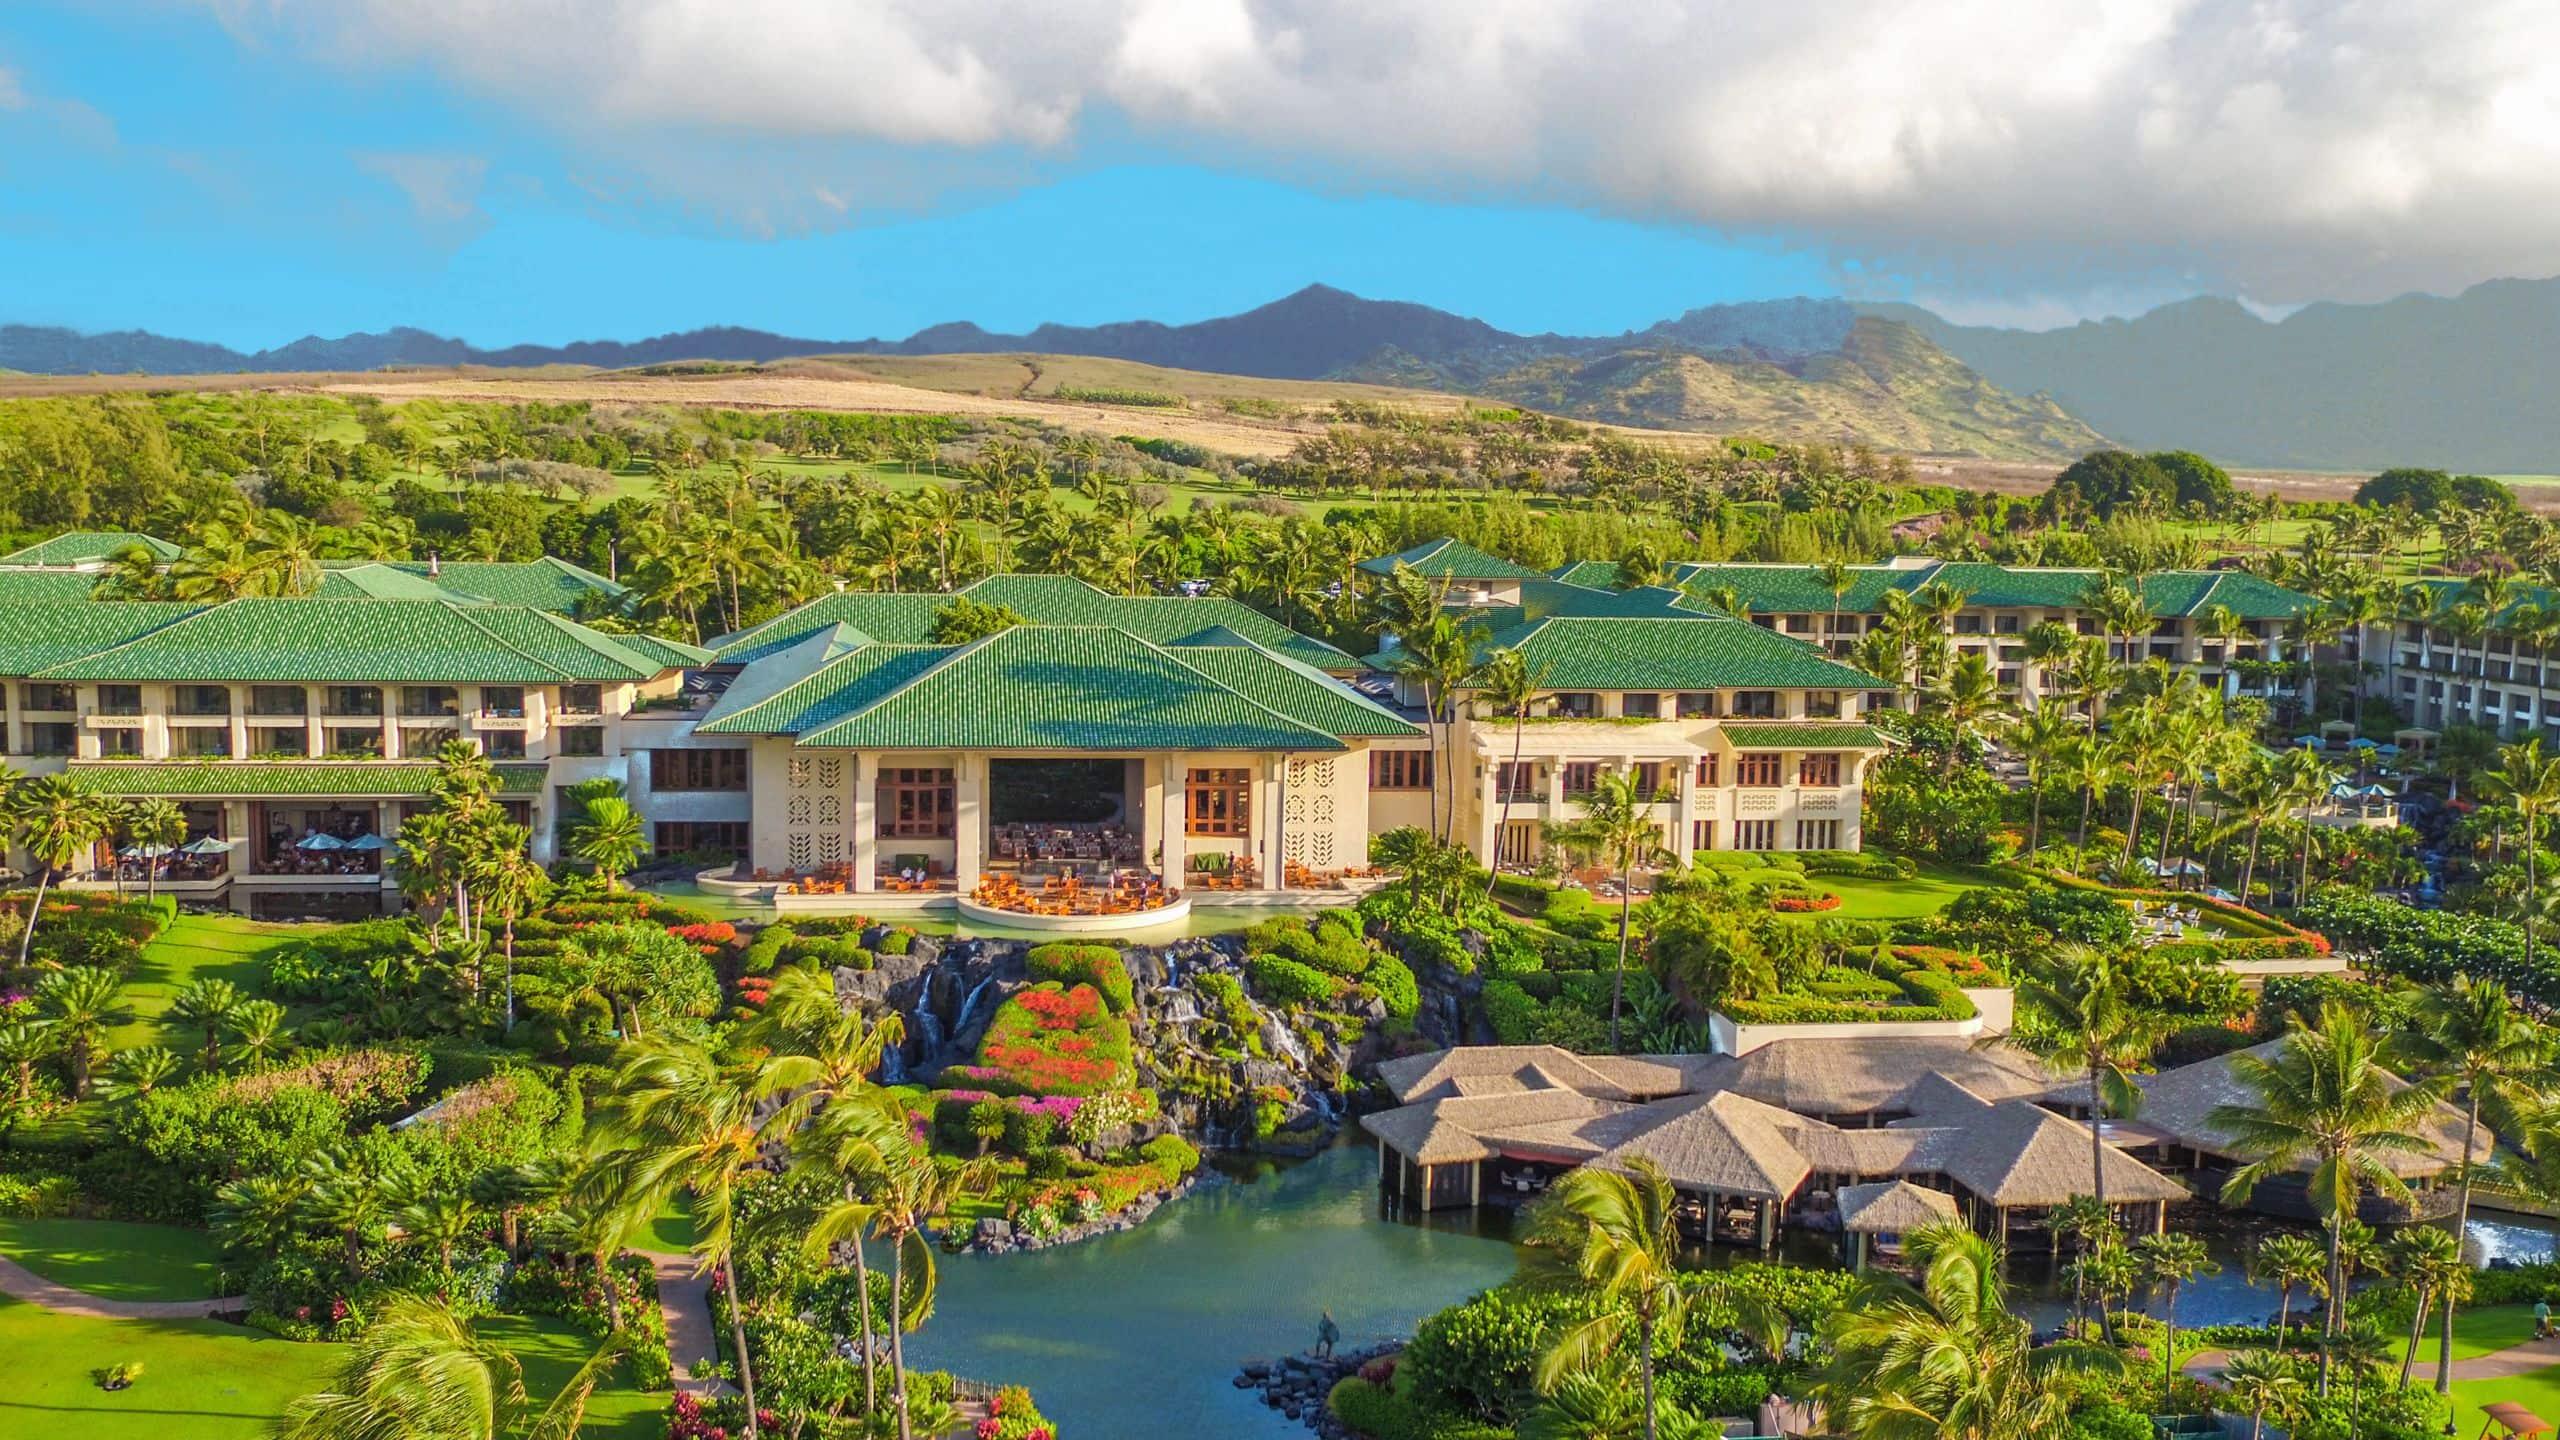 Hotel Deals in Kauai | Grand Hyatt Kauai Resort & Spa